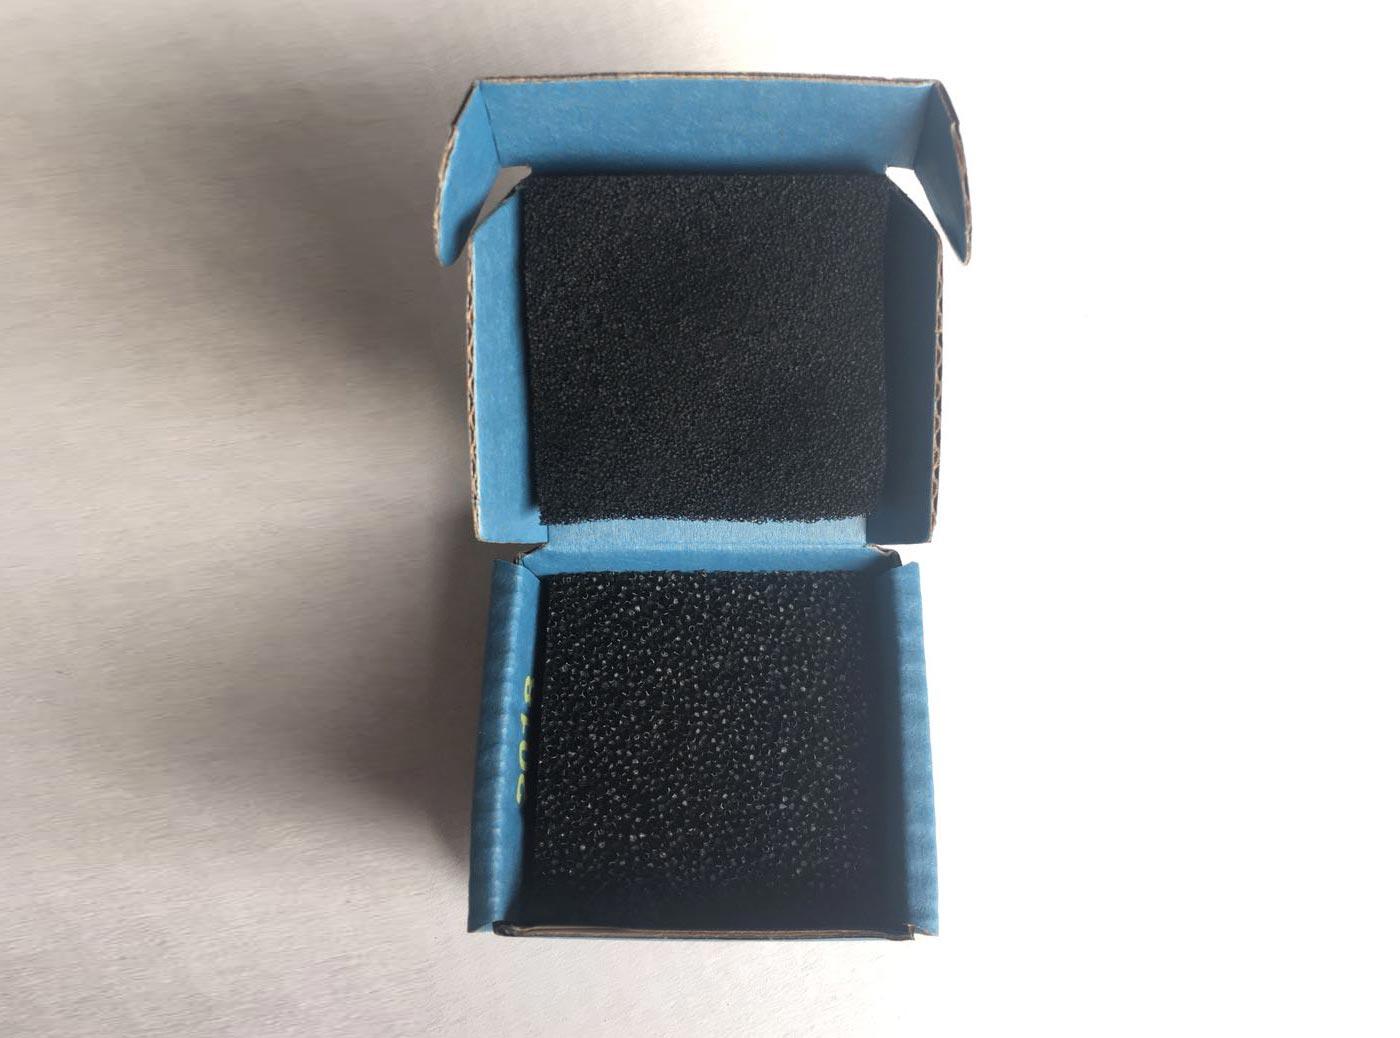 Anti-Statc Box for PCBs | Hans Kolb TVS-01/02 ESD Cardboard Box with Conductive Foam